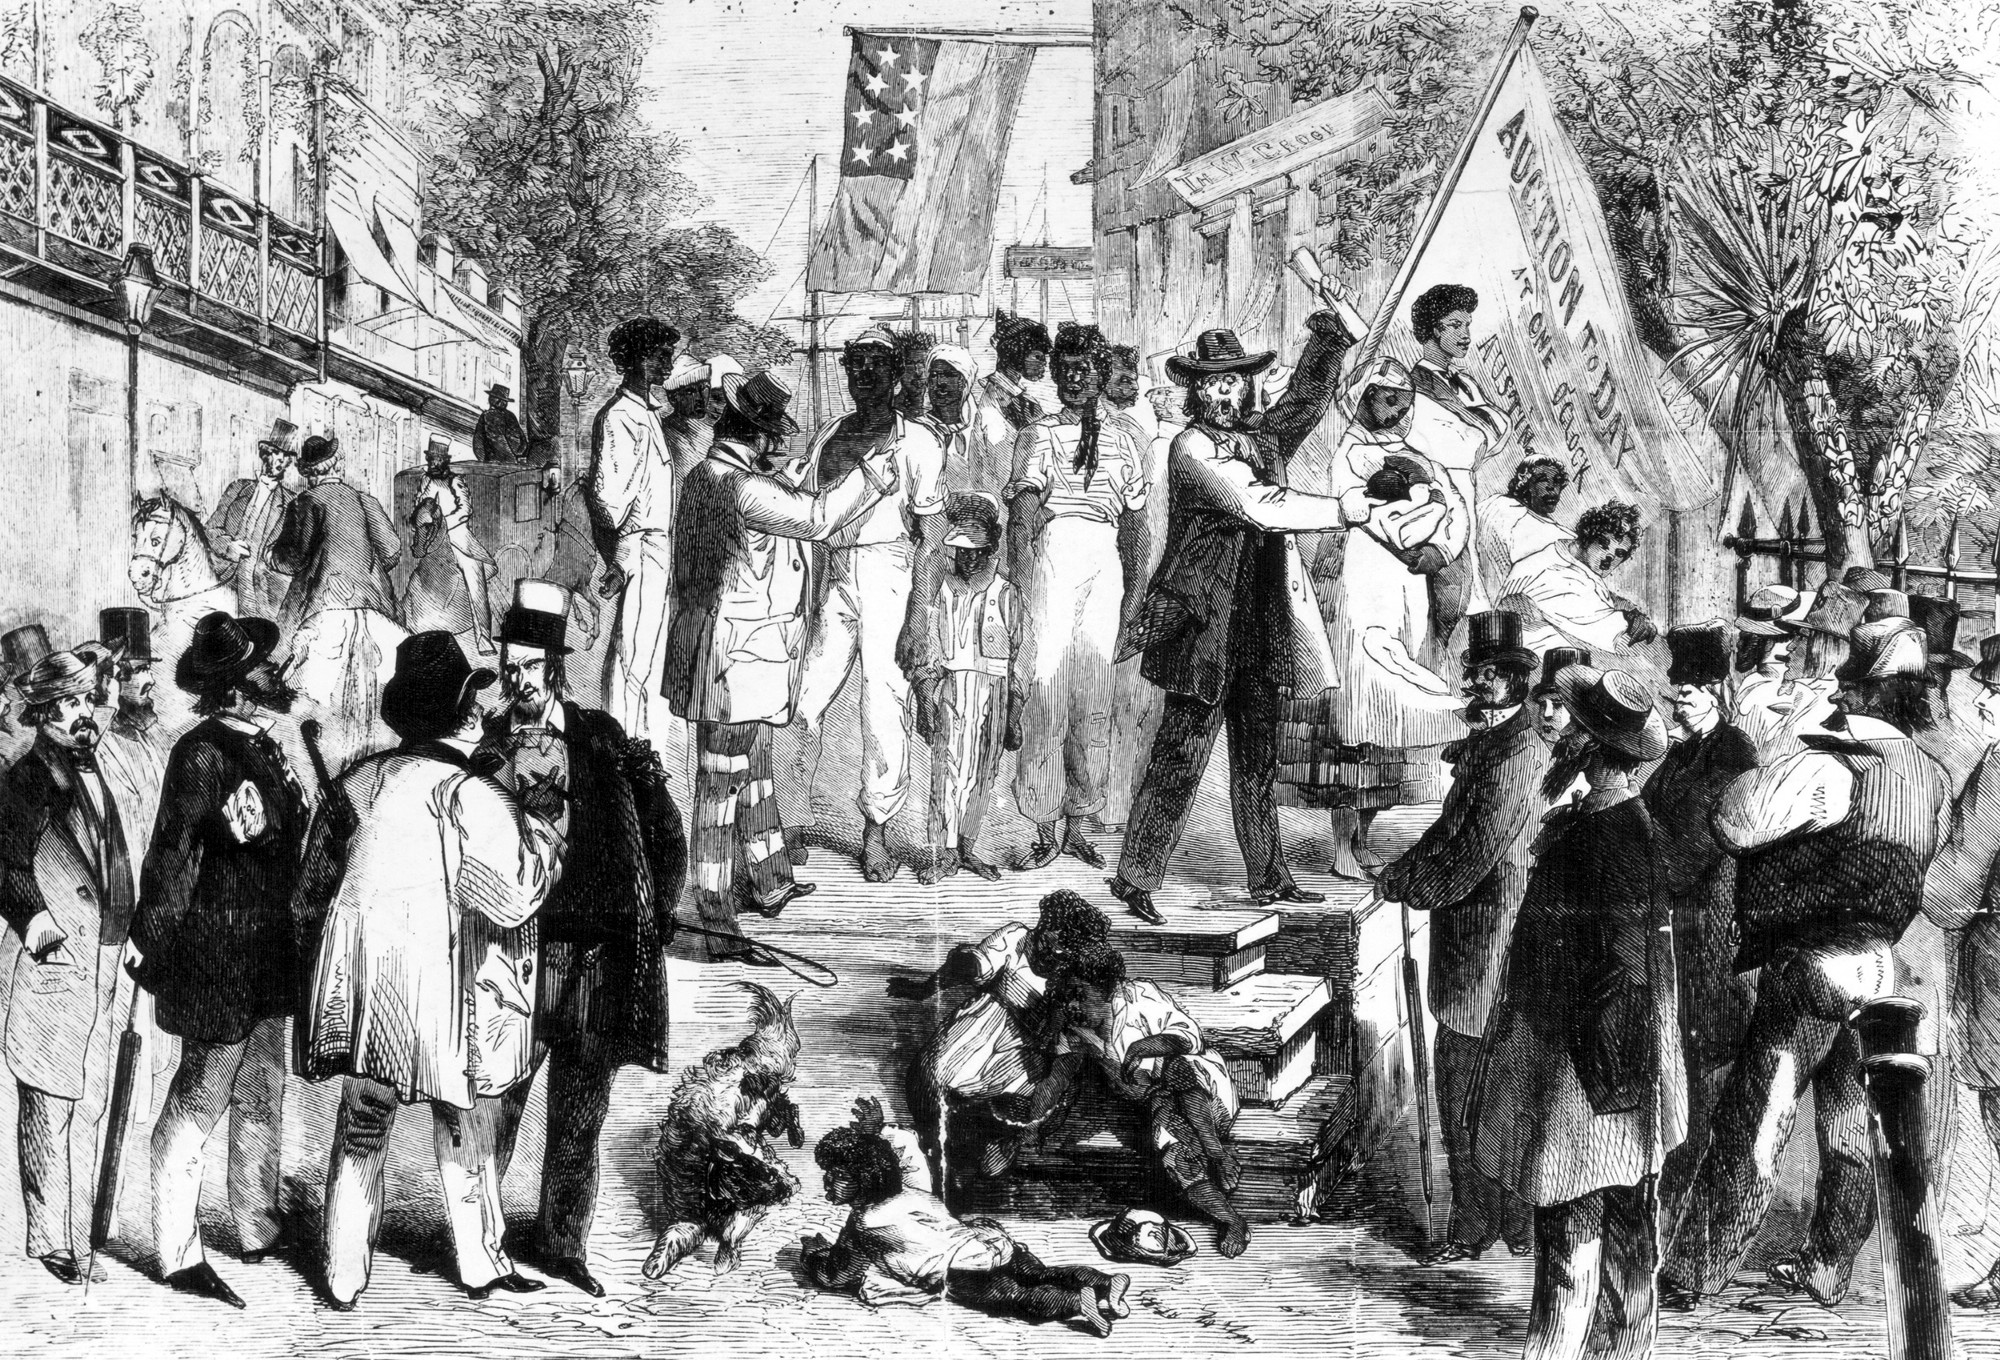 African American History, Black History, Slavery, US Slavery, Galveston Salves, Galveston Island, Texas History, KOLUMN Magazine, KOLUMN, KINDR'D Magazine, KINDR'D